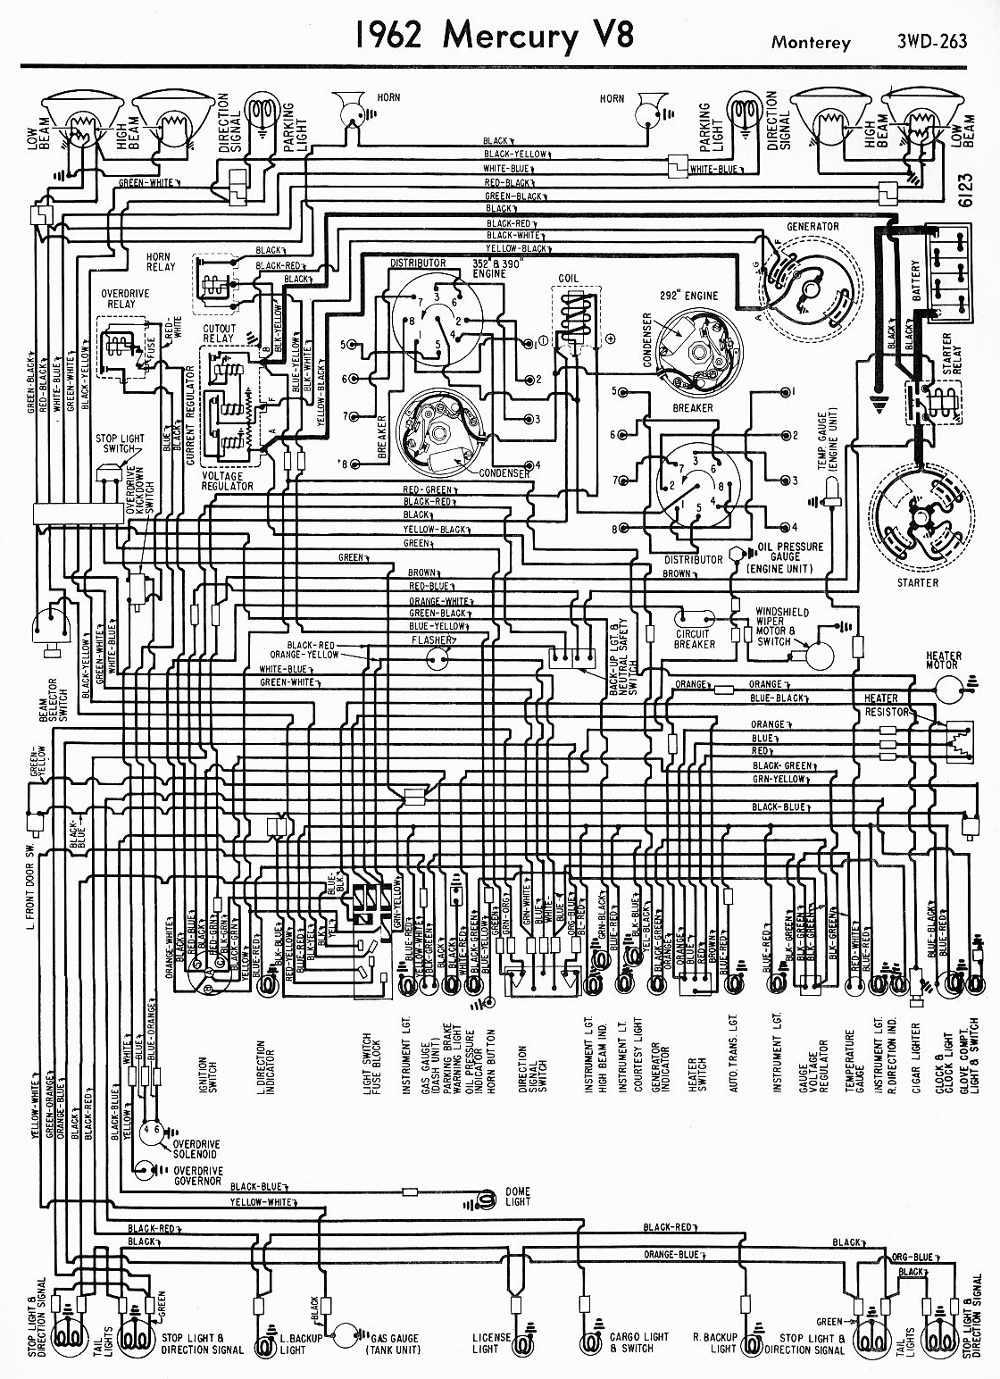 1962 ford galaxie color wiring diagram mercury zephyr 1950 ford wiring diagram wiring diagram ford 1936 [ 1000 x 1379 Pixel ]